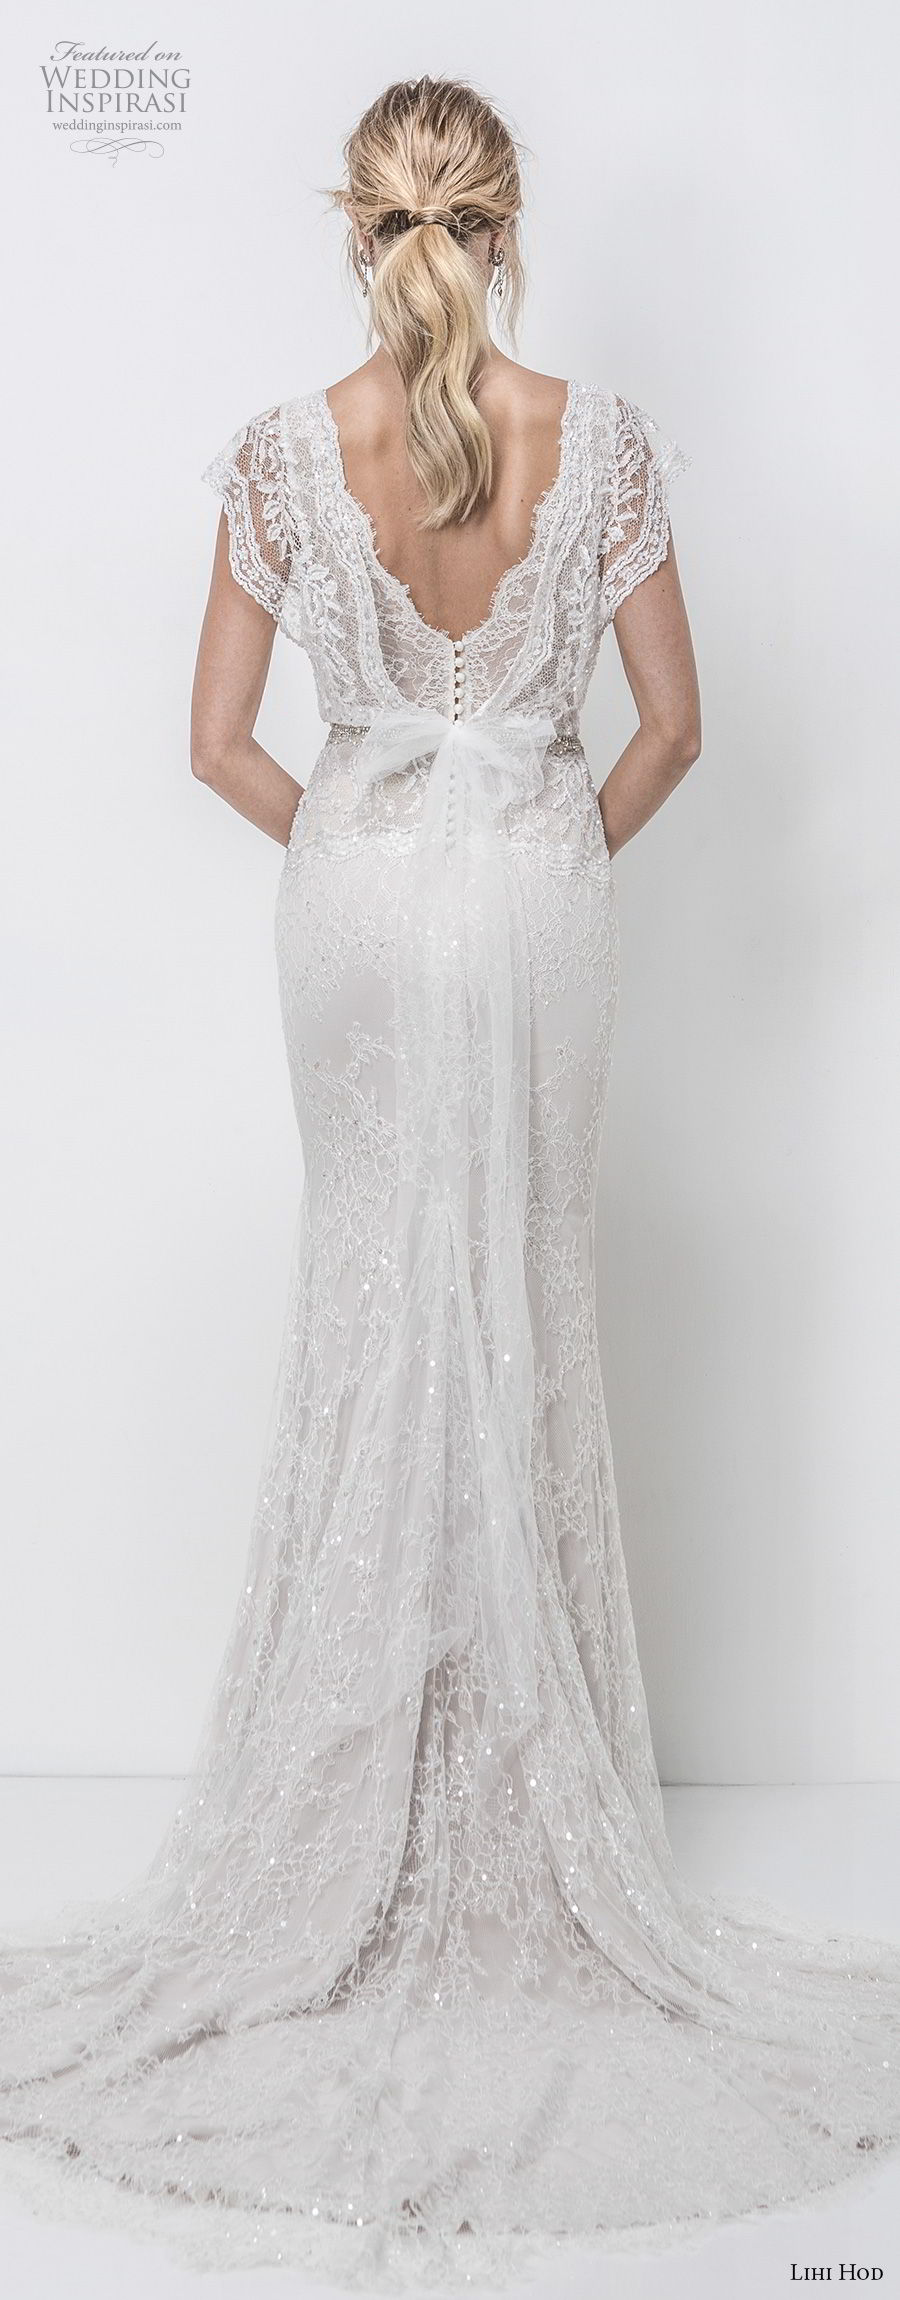 Lihi hod fall 2018 wedding dresses crazyforus for Butterfly back wedding dress